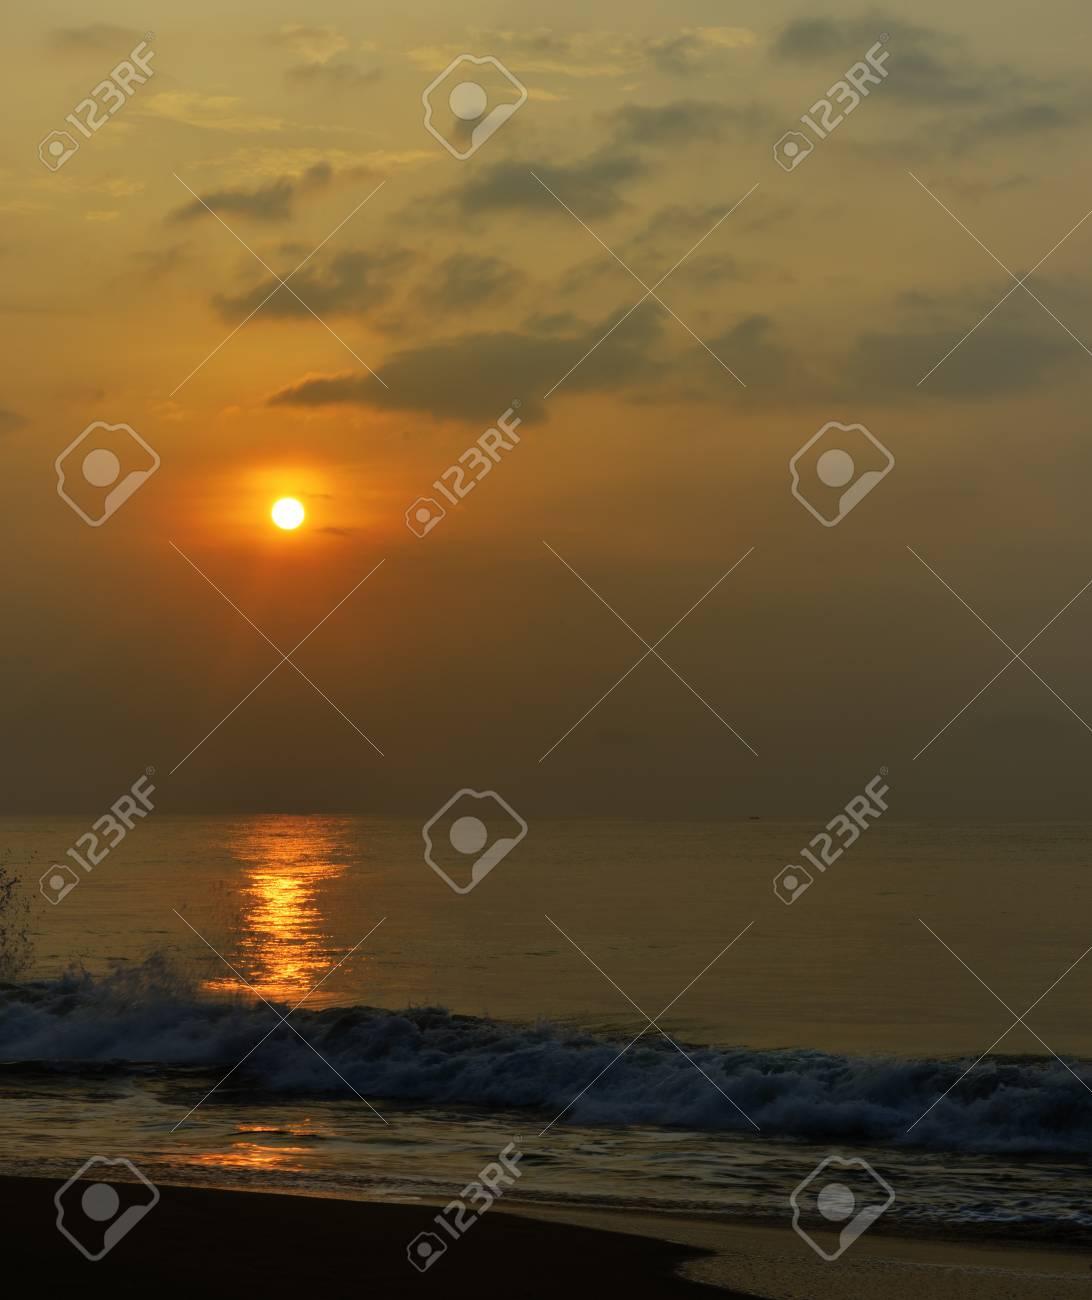 Sunrise over the ocean. The coast of the Indian ocean. The Island Of Sri Lanka Stock Photo - 17719062